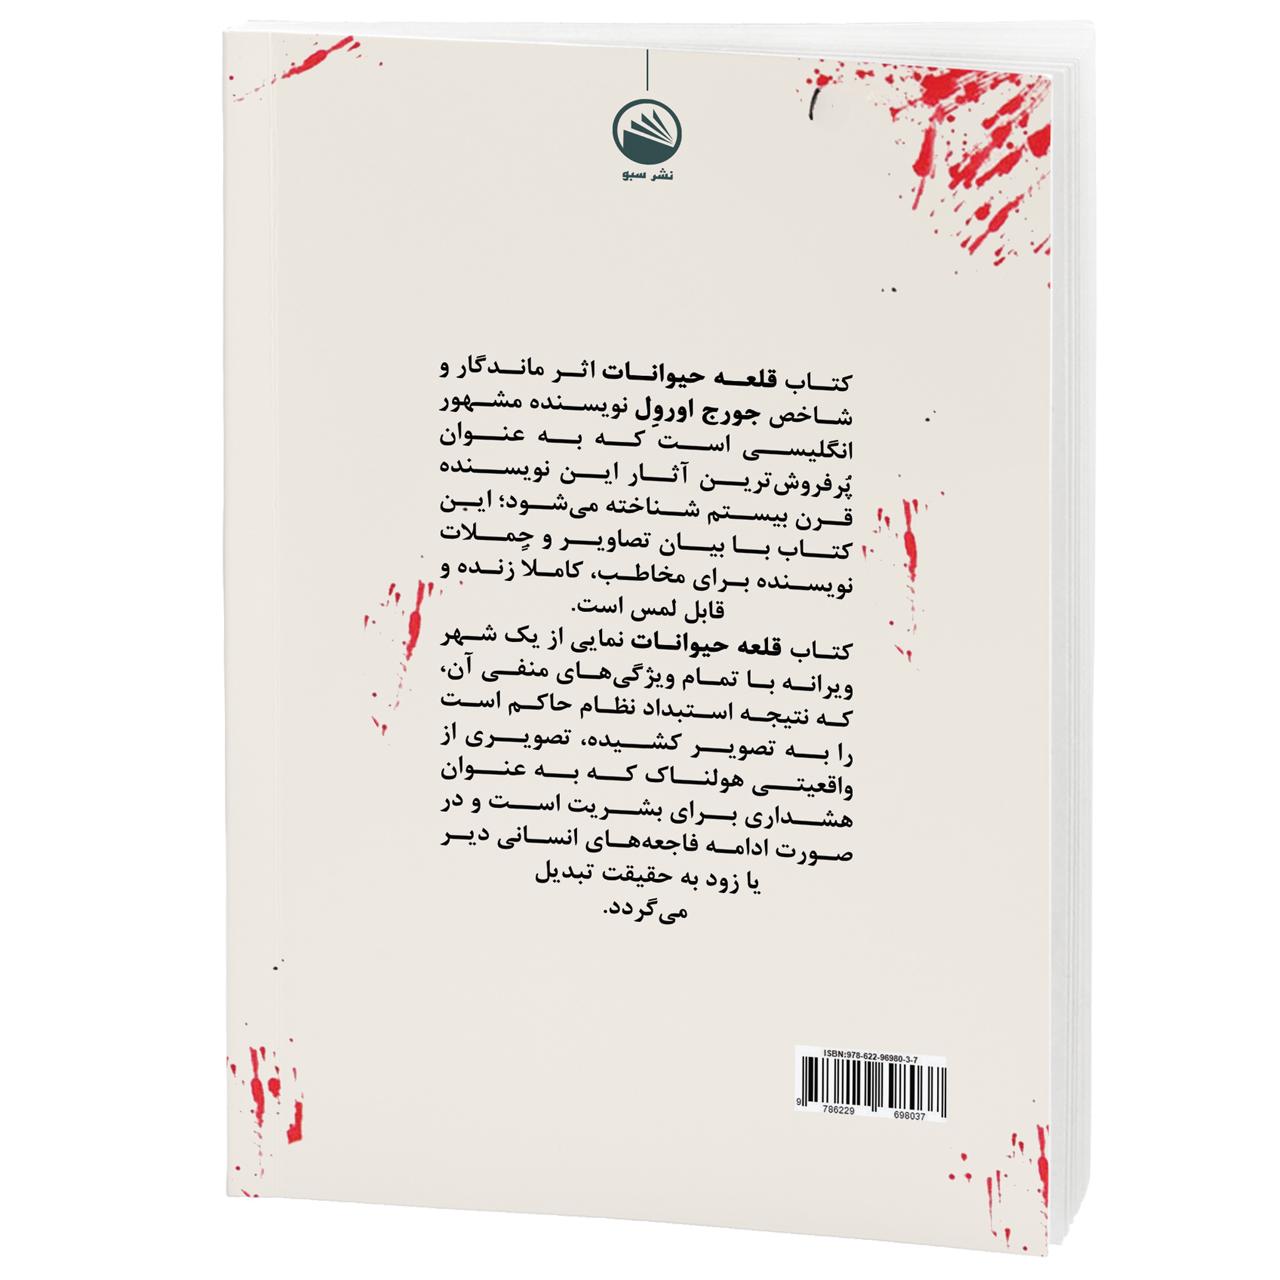 کتاب قلعه حیوانات اثر جورج اورول نشر سبو